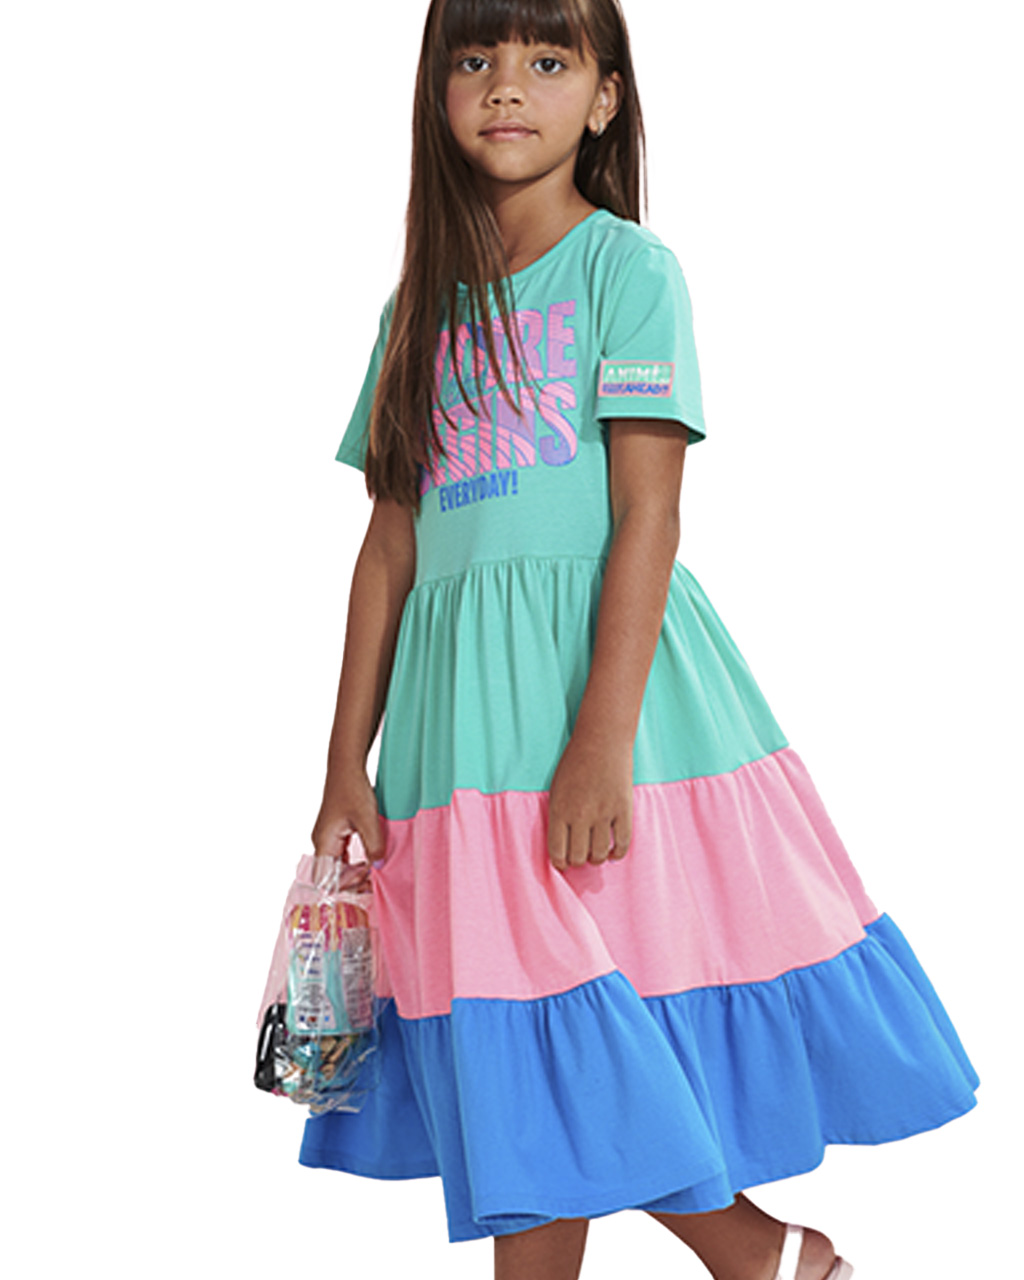 Vestido Infantil Recortes Coloridos Animê